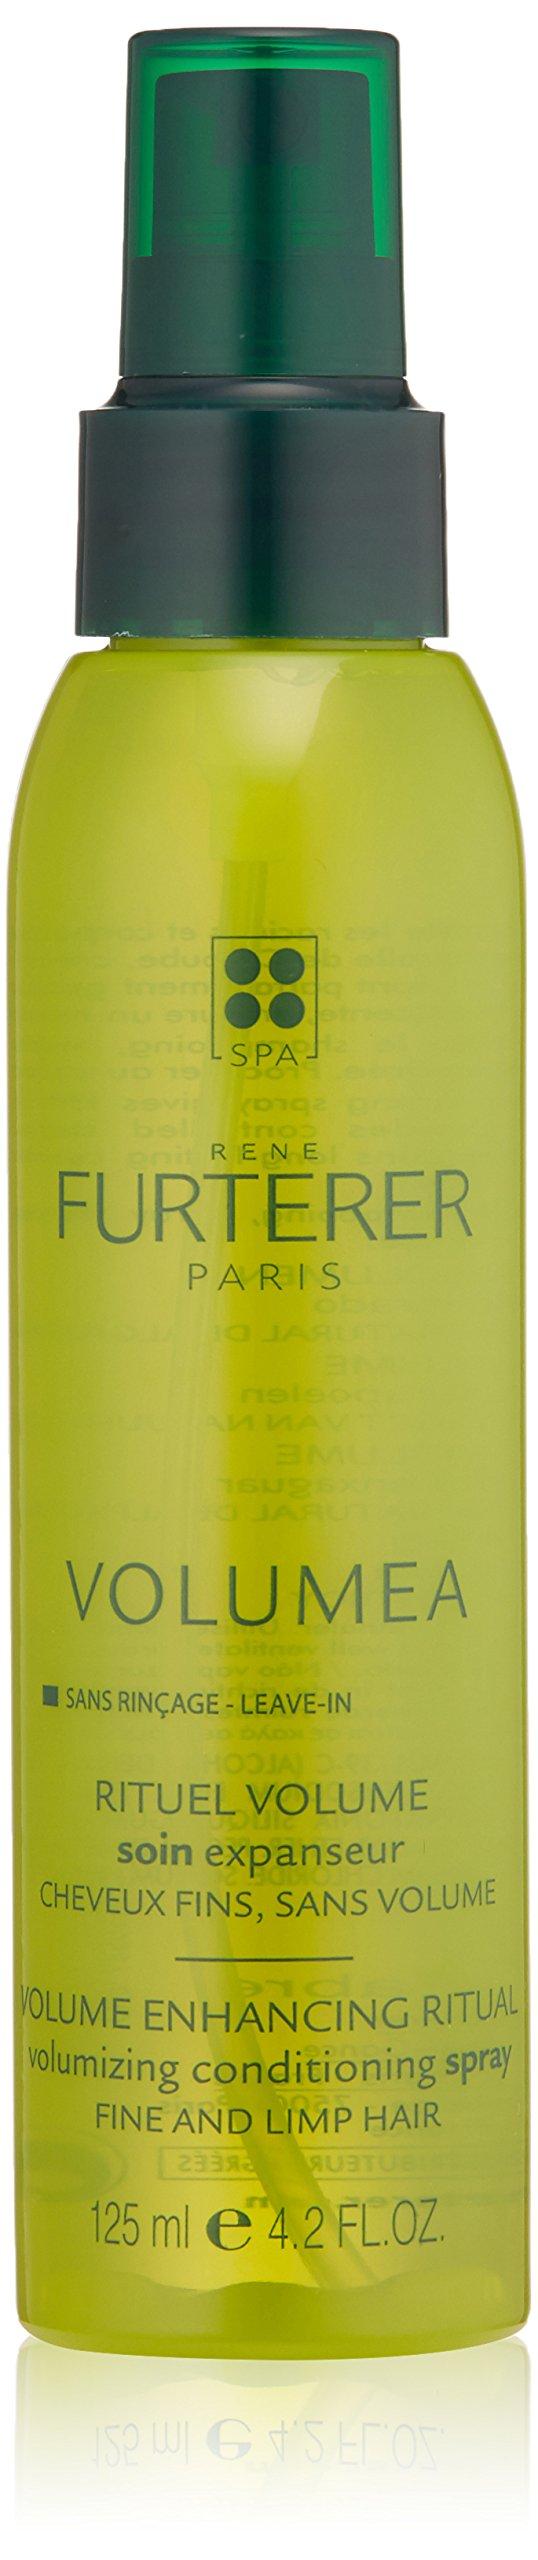 Rene Furterer Volumea Volumizing Conditioning Spray, 4.2 fl. oz.